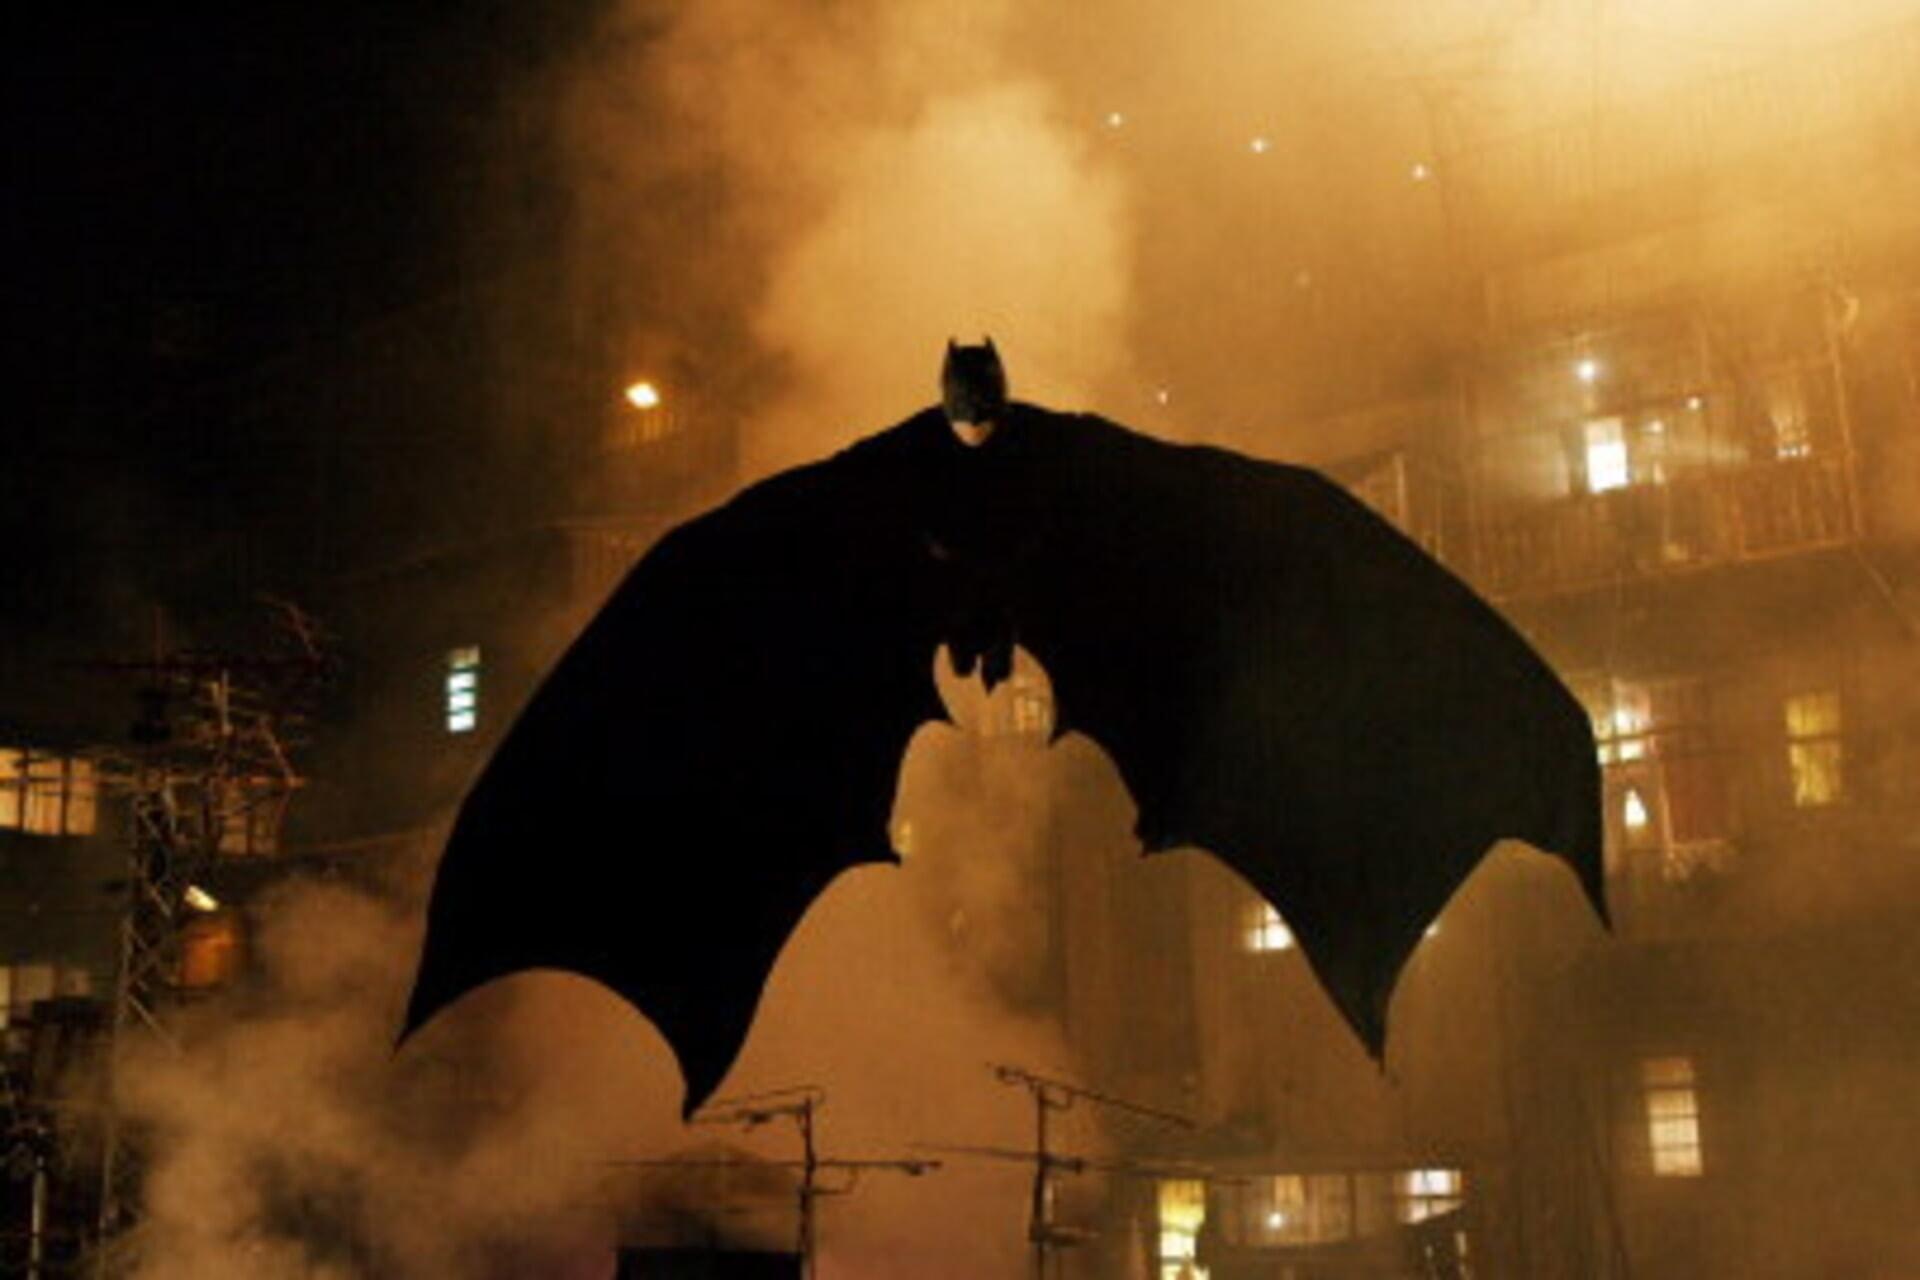 Batman Begins - Image 30